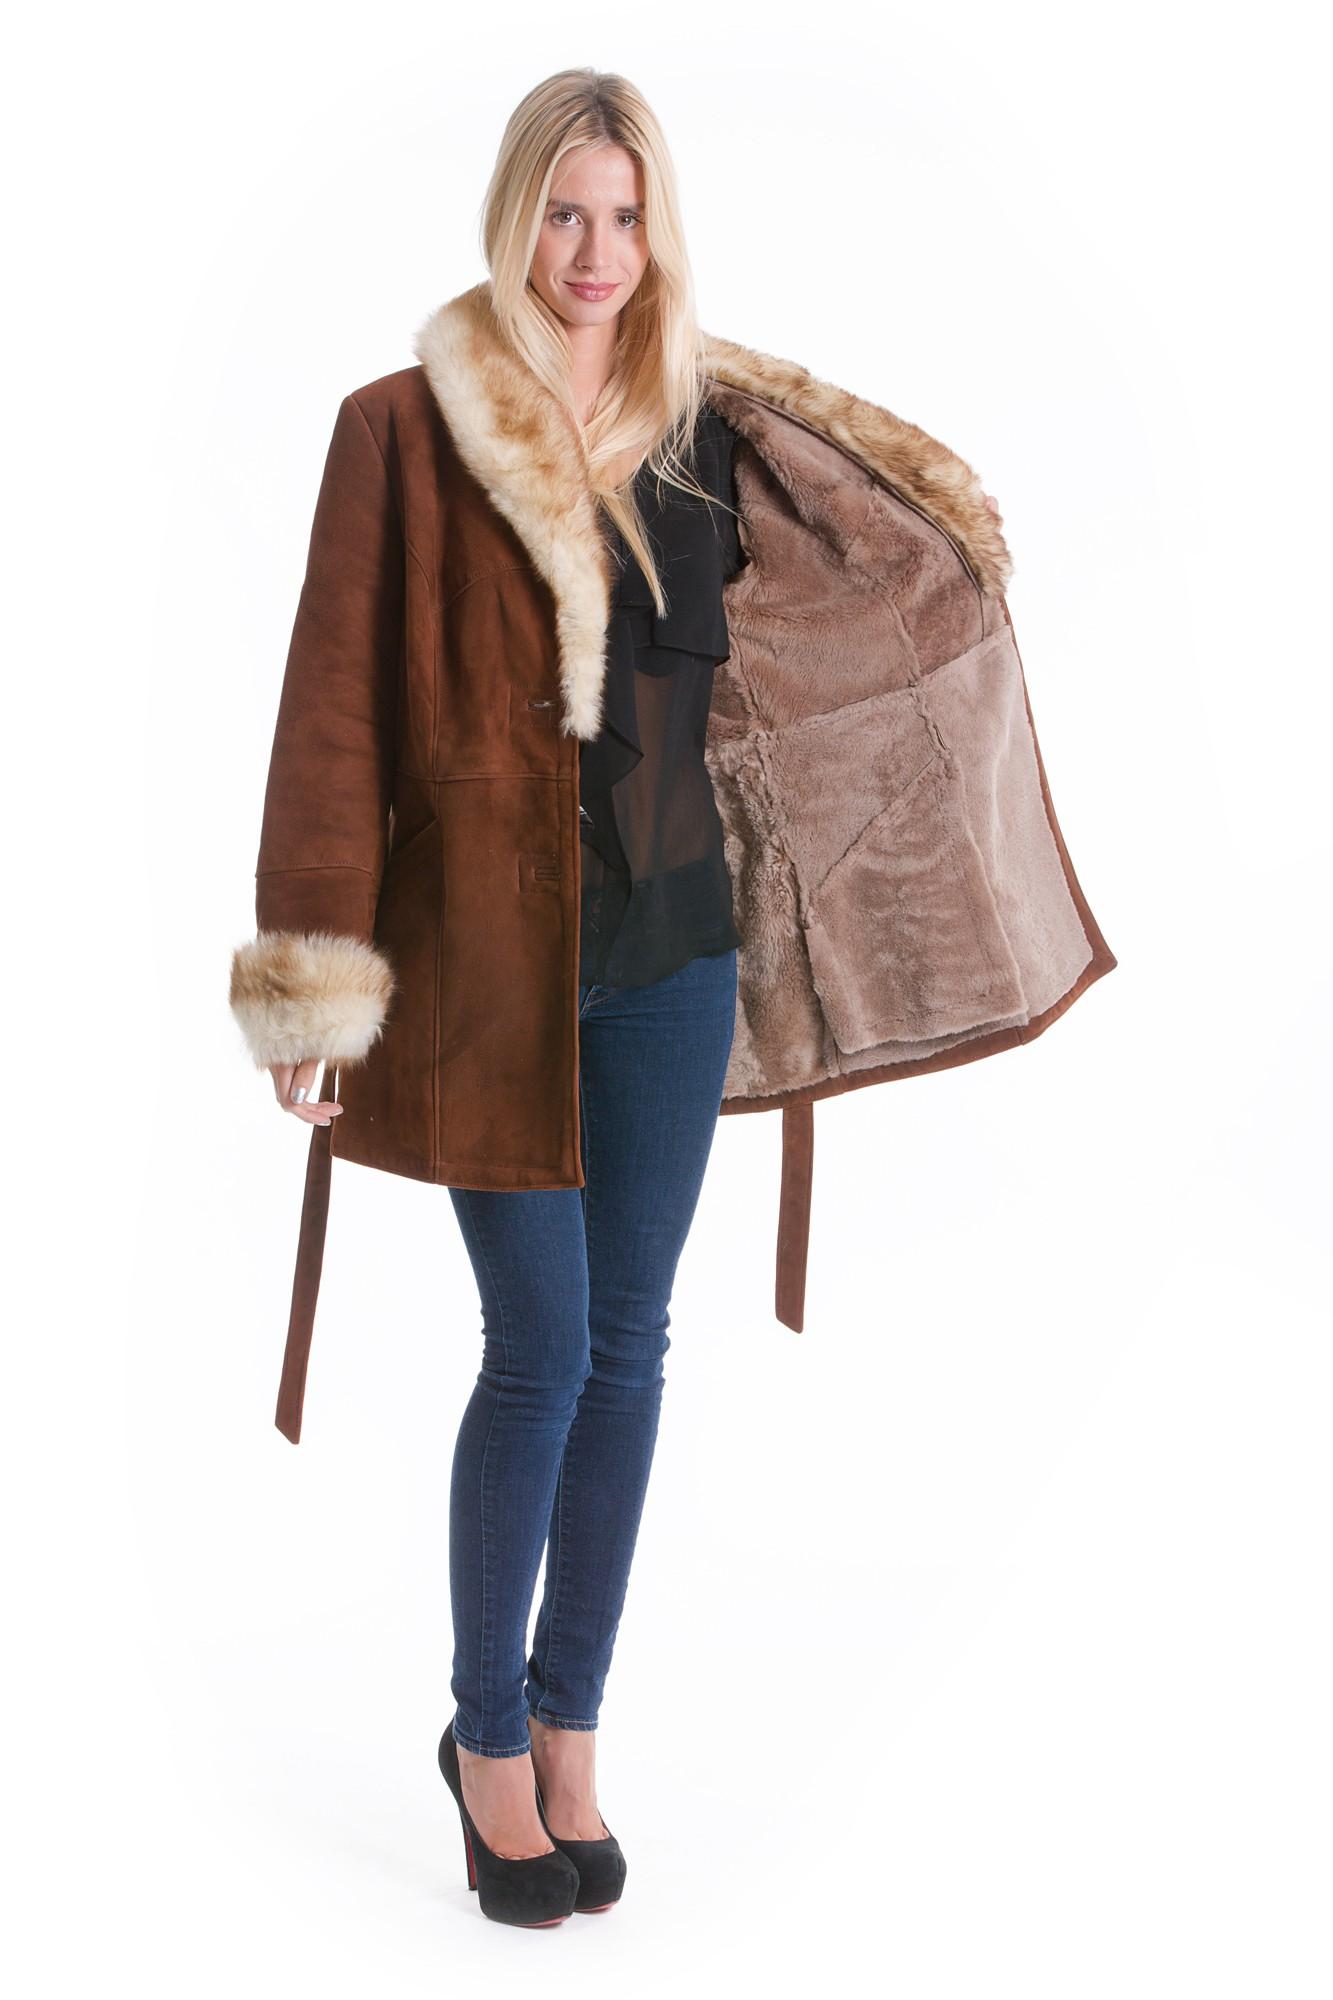 Buy Sheepskin Leather Fashion Style Jacket Fur Collar